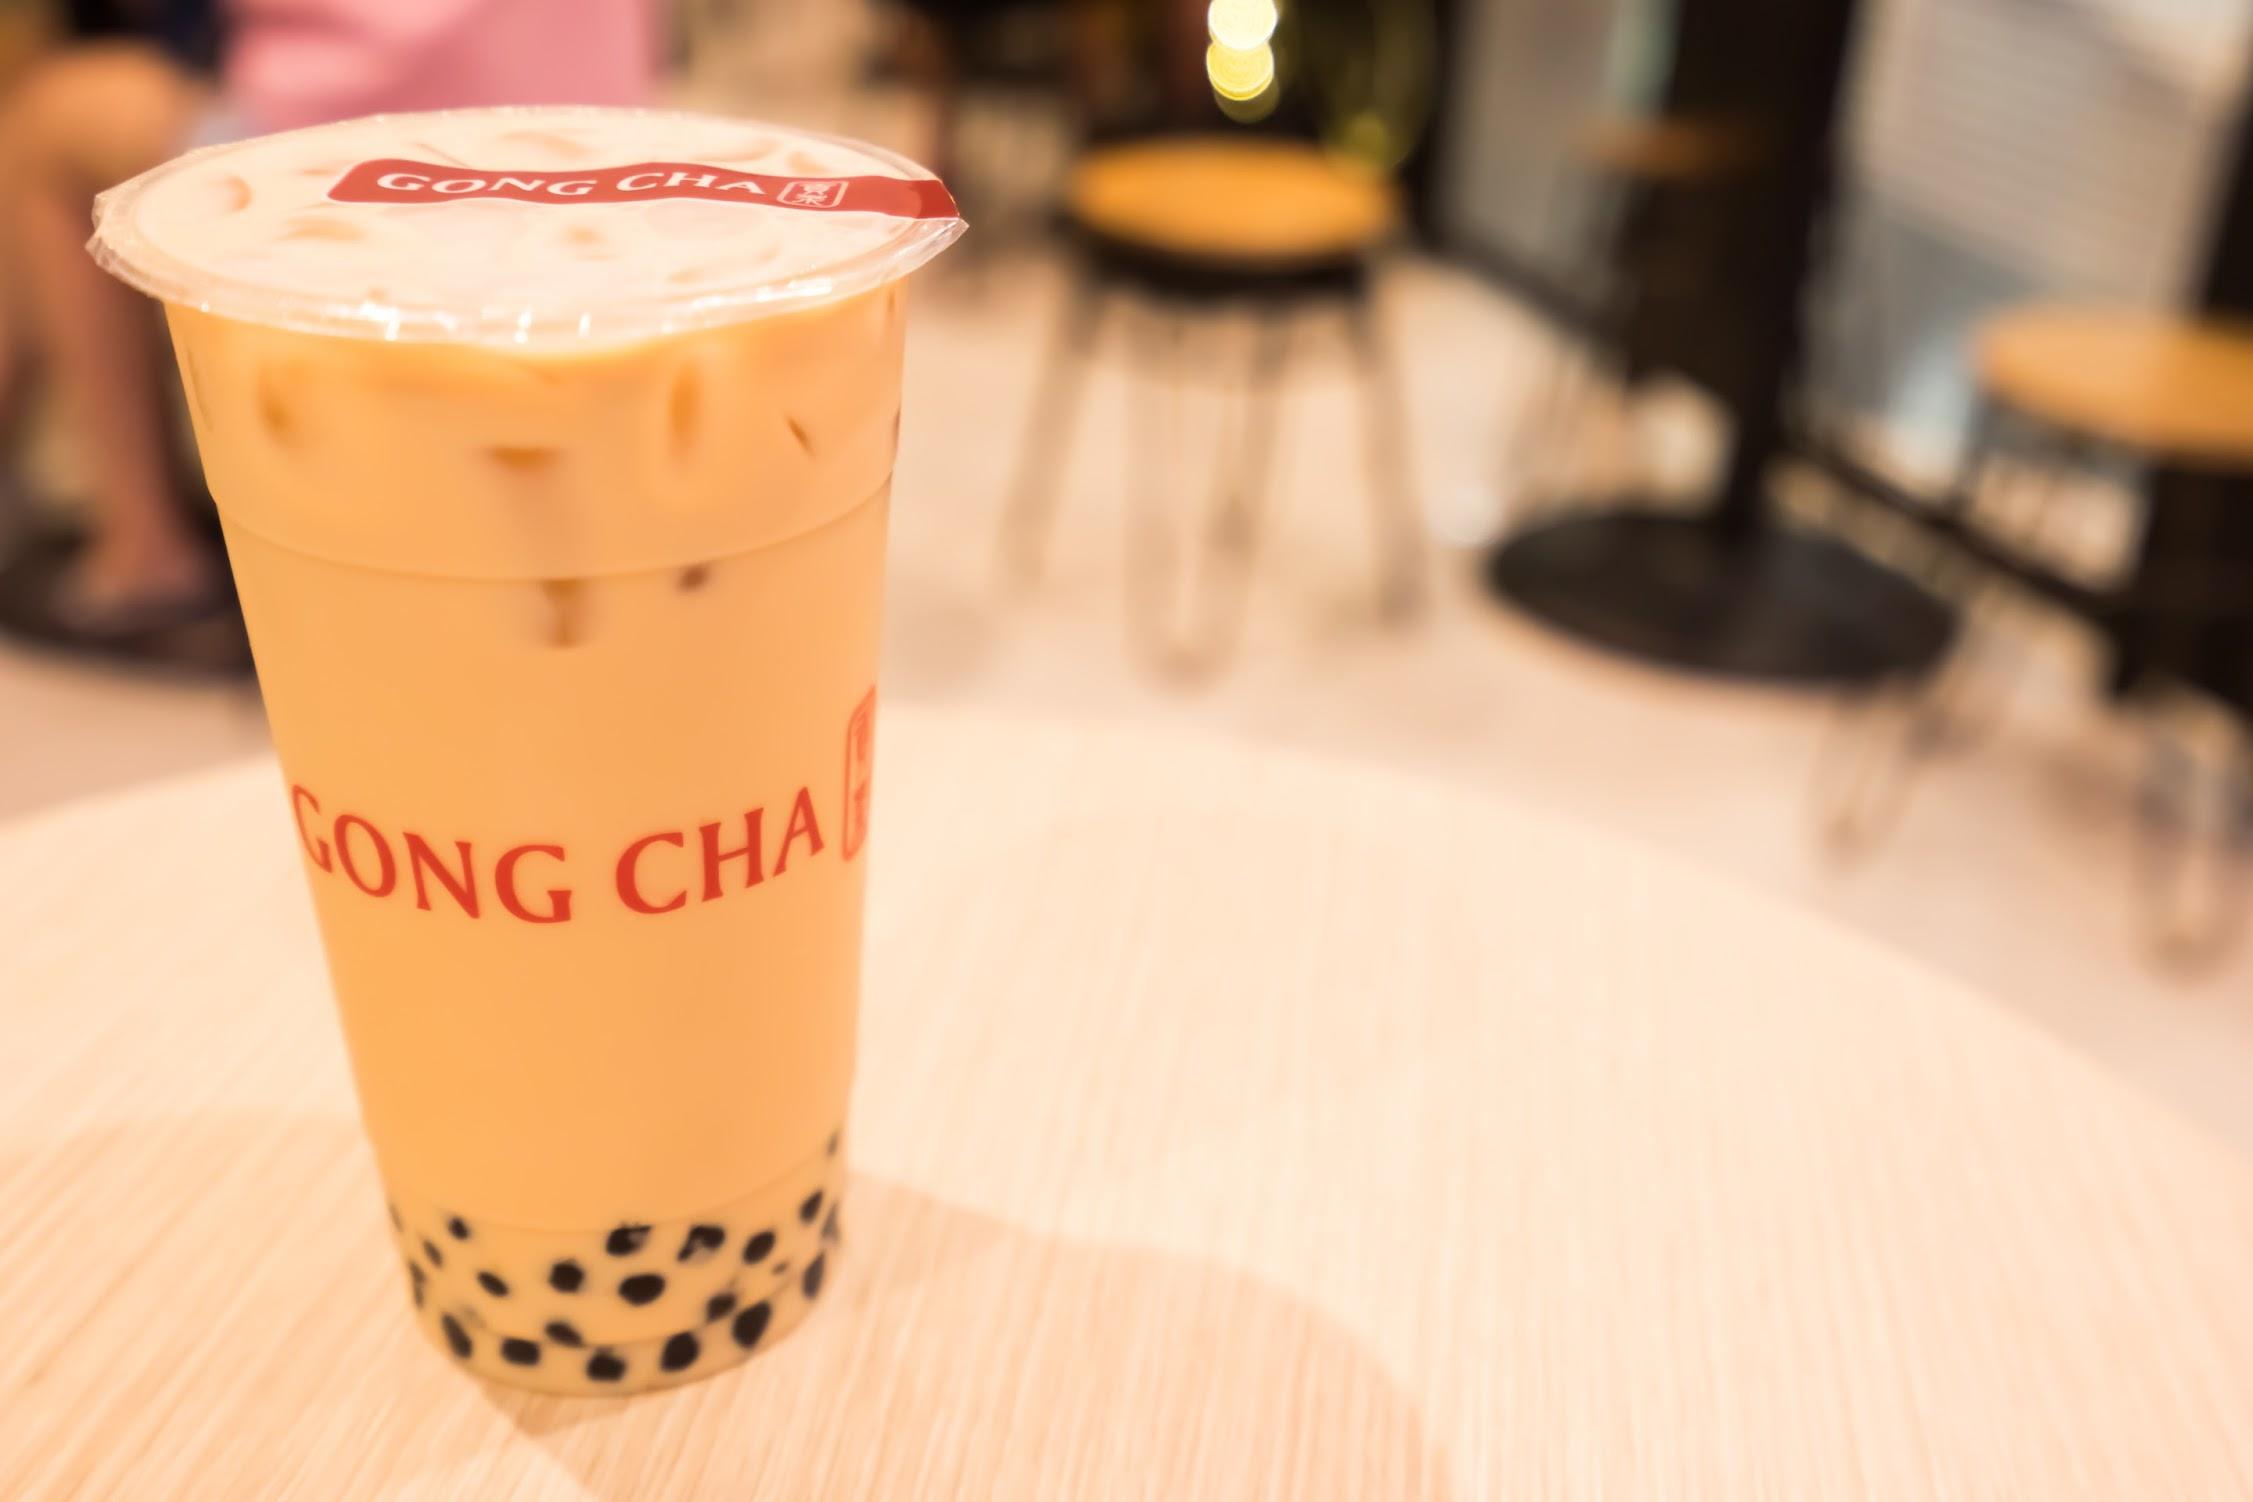 Singapore Gong Cha